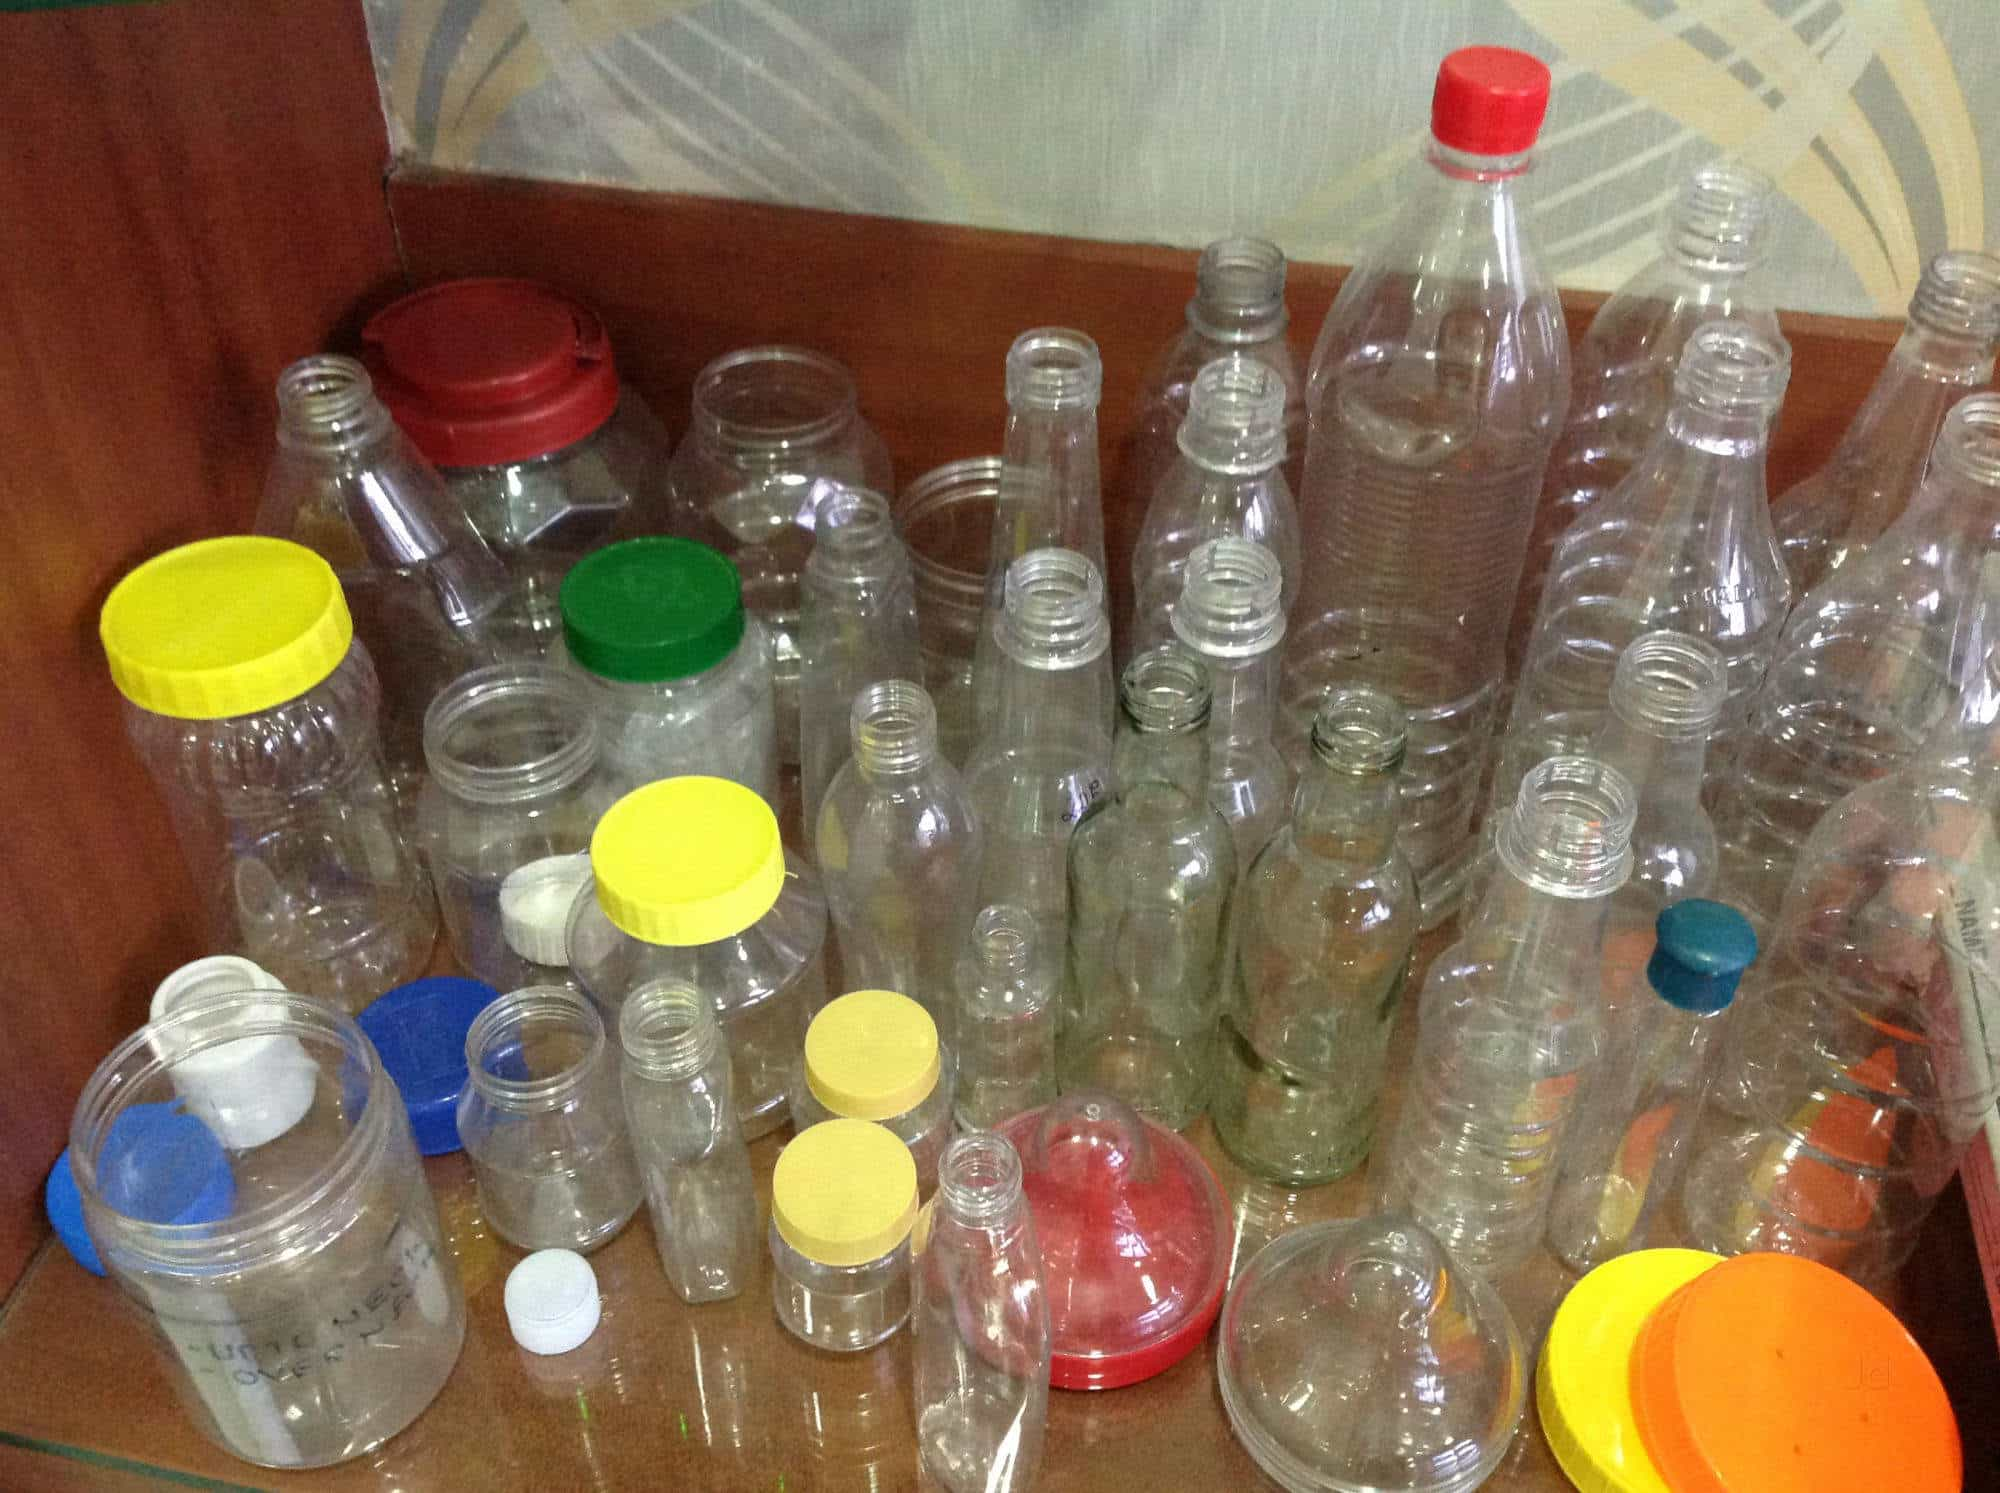 ac52a2a6cc79 Indo Plast Packaging Pvt Ltd, Chittaranjan Avenue - Pet Bottle ...